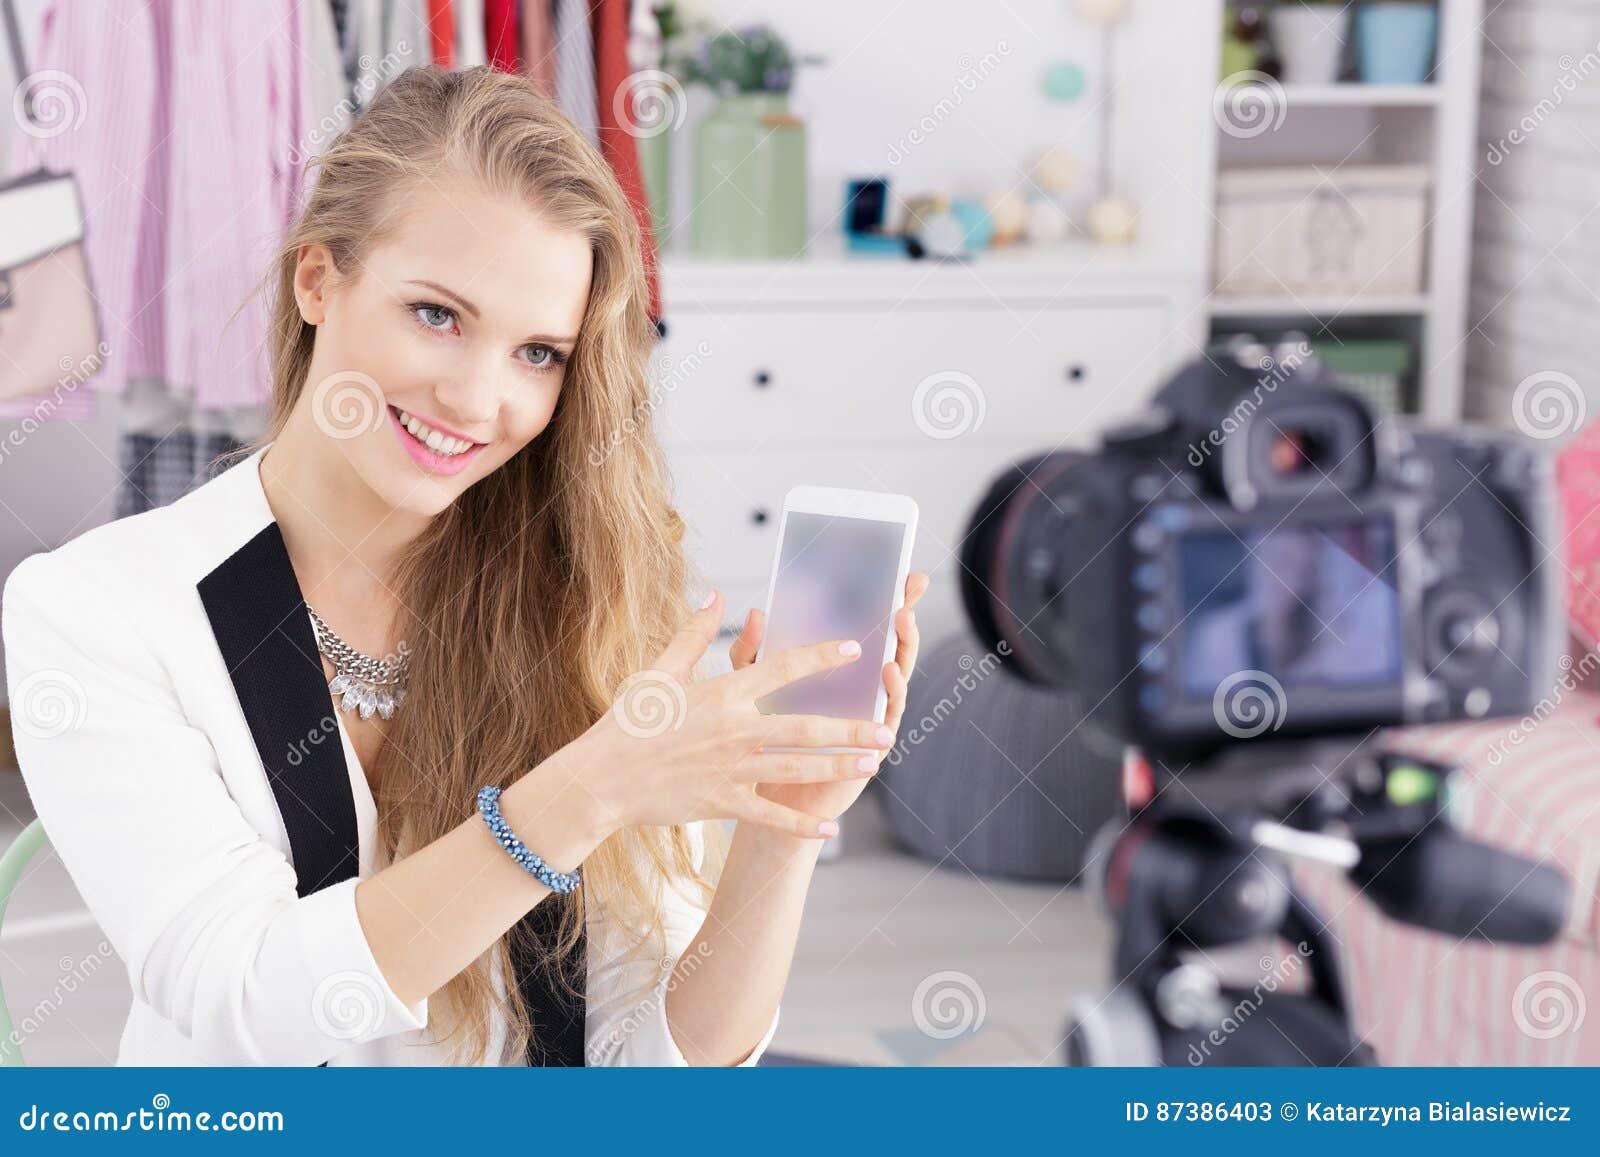 Blog Popular teen